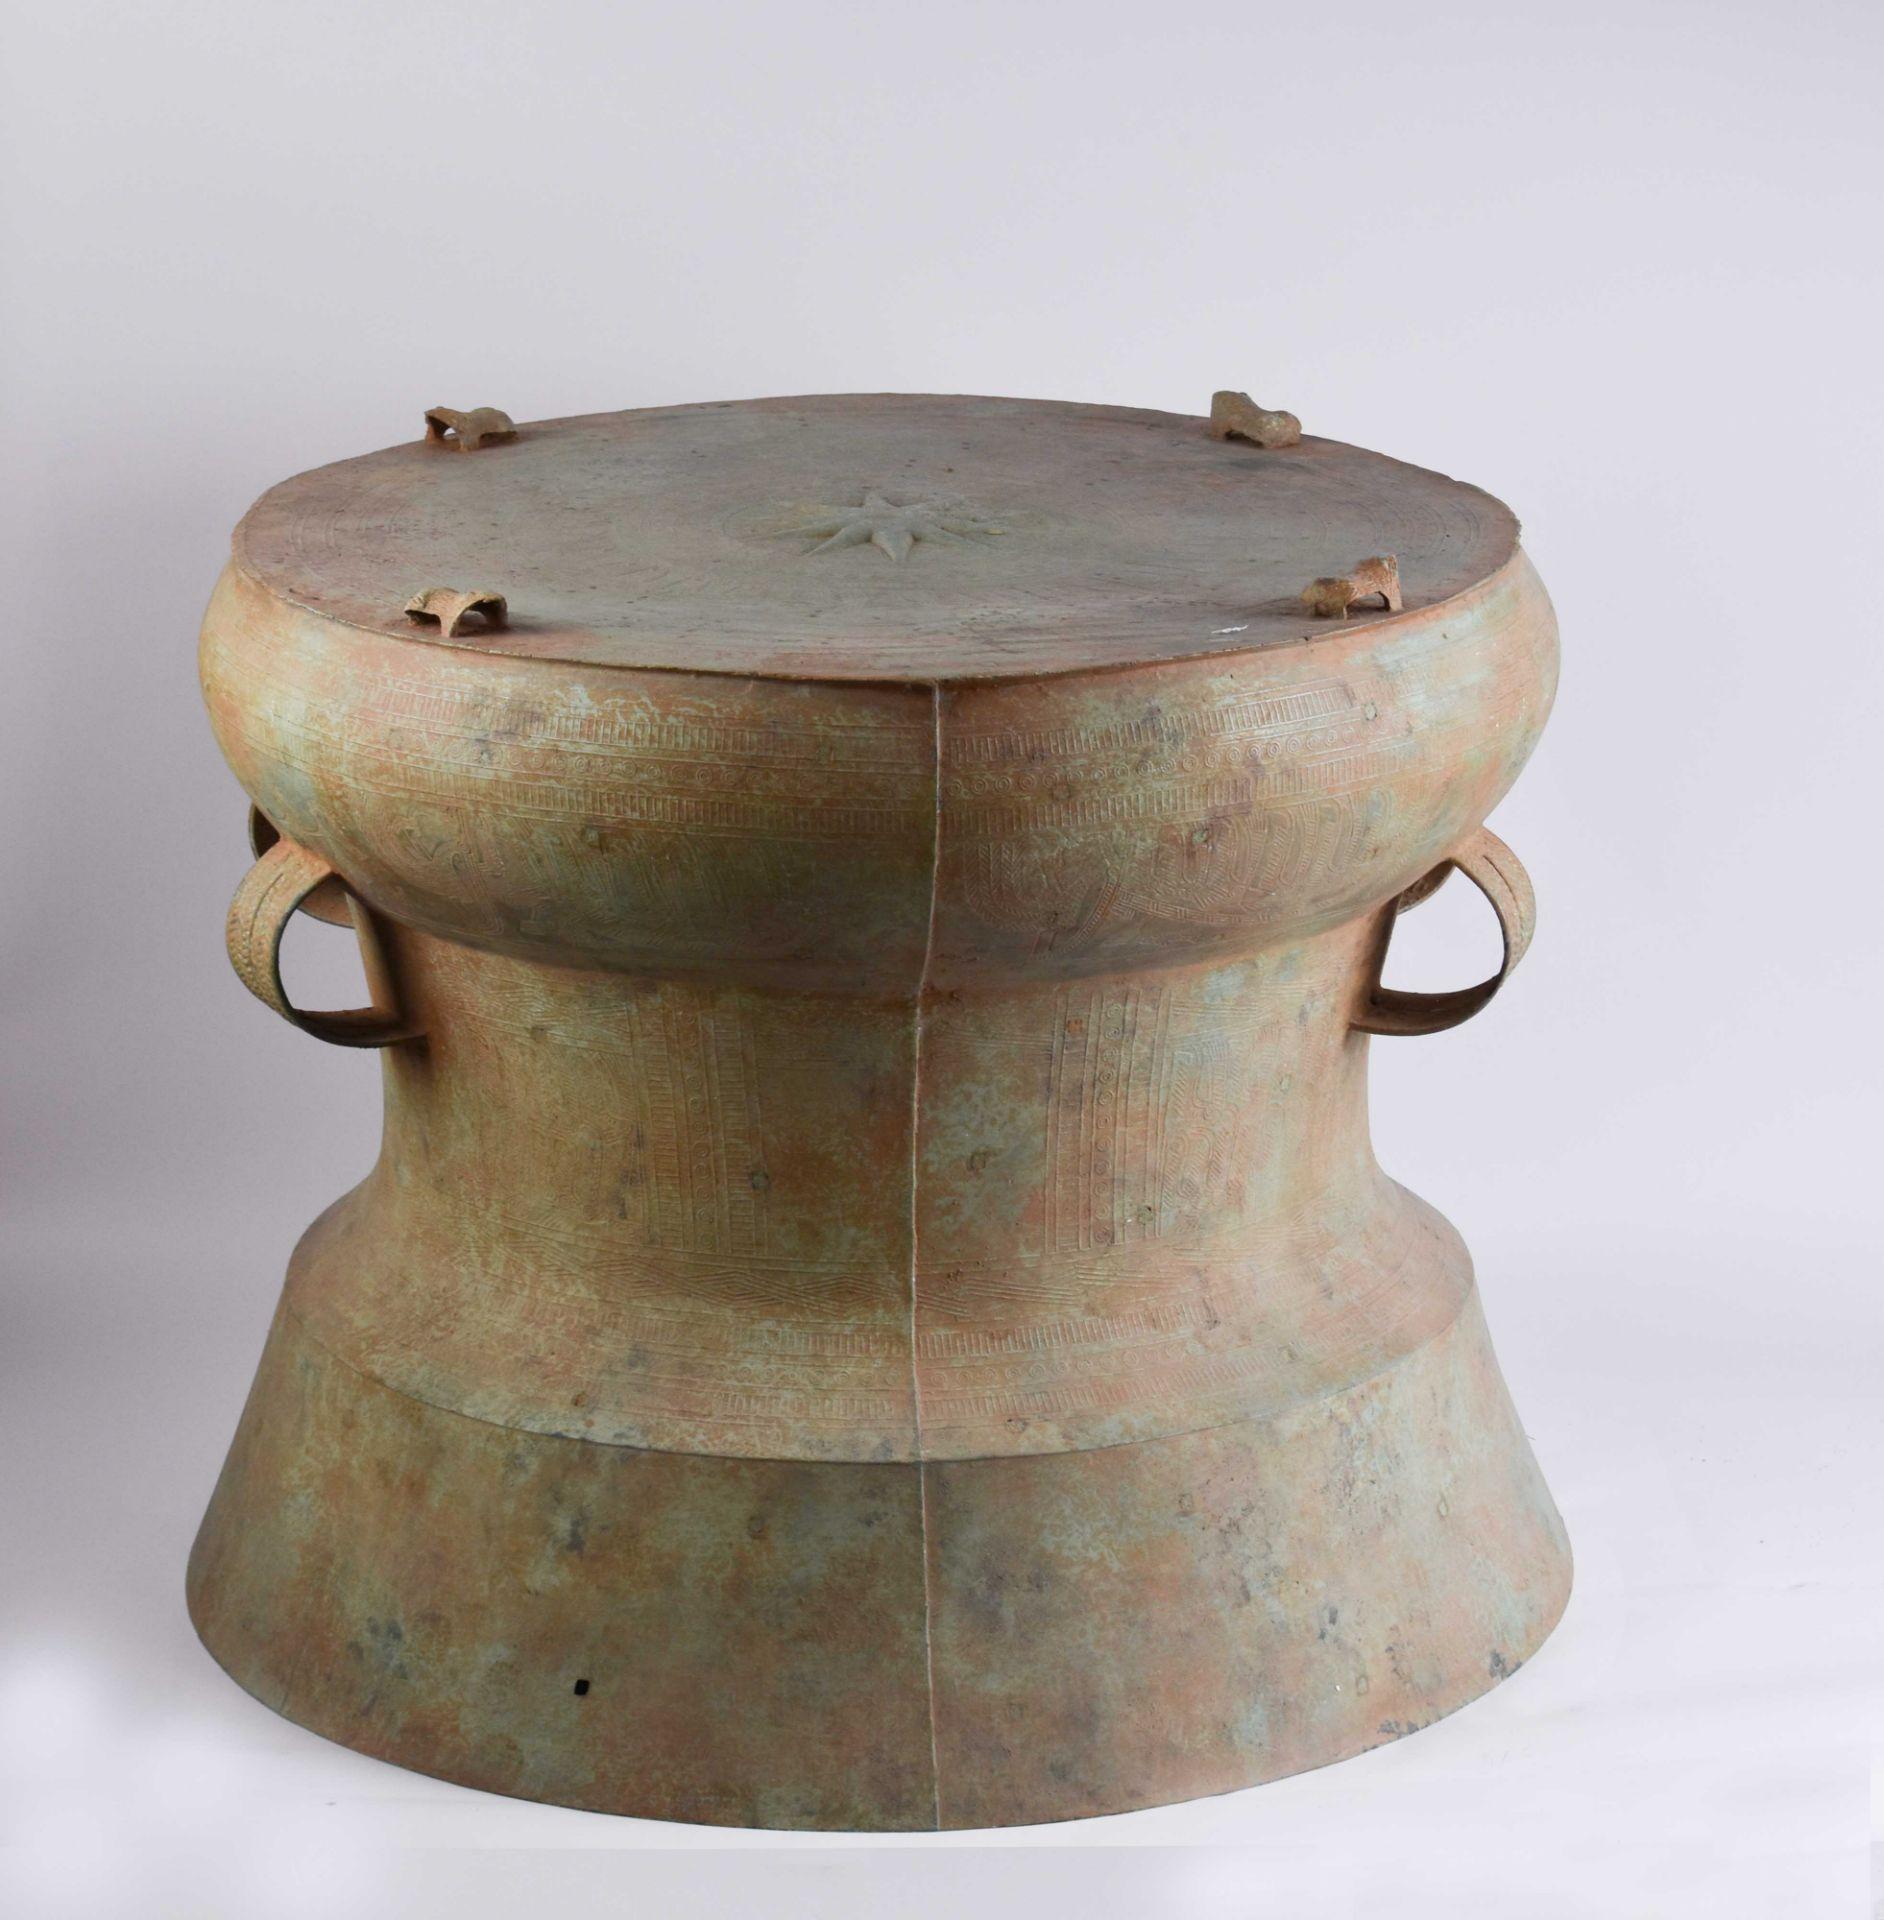 Ritual bronze drum Vietnam Dong-Son period - Image 2 of 9